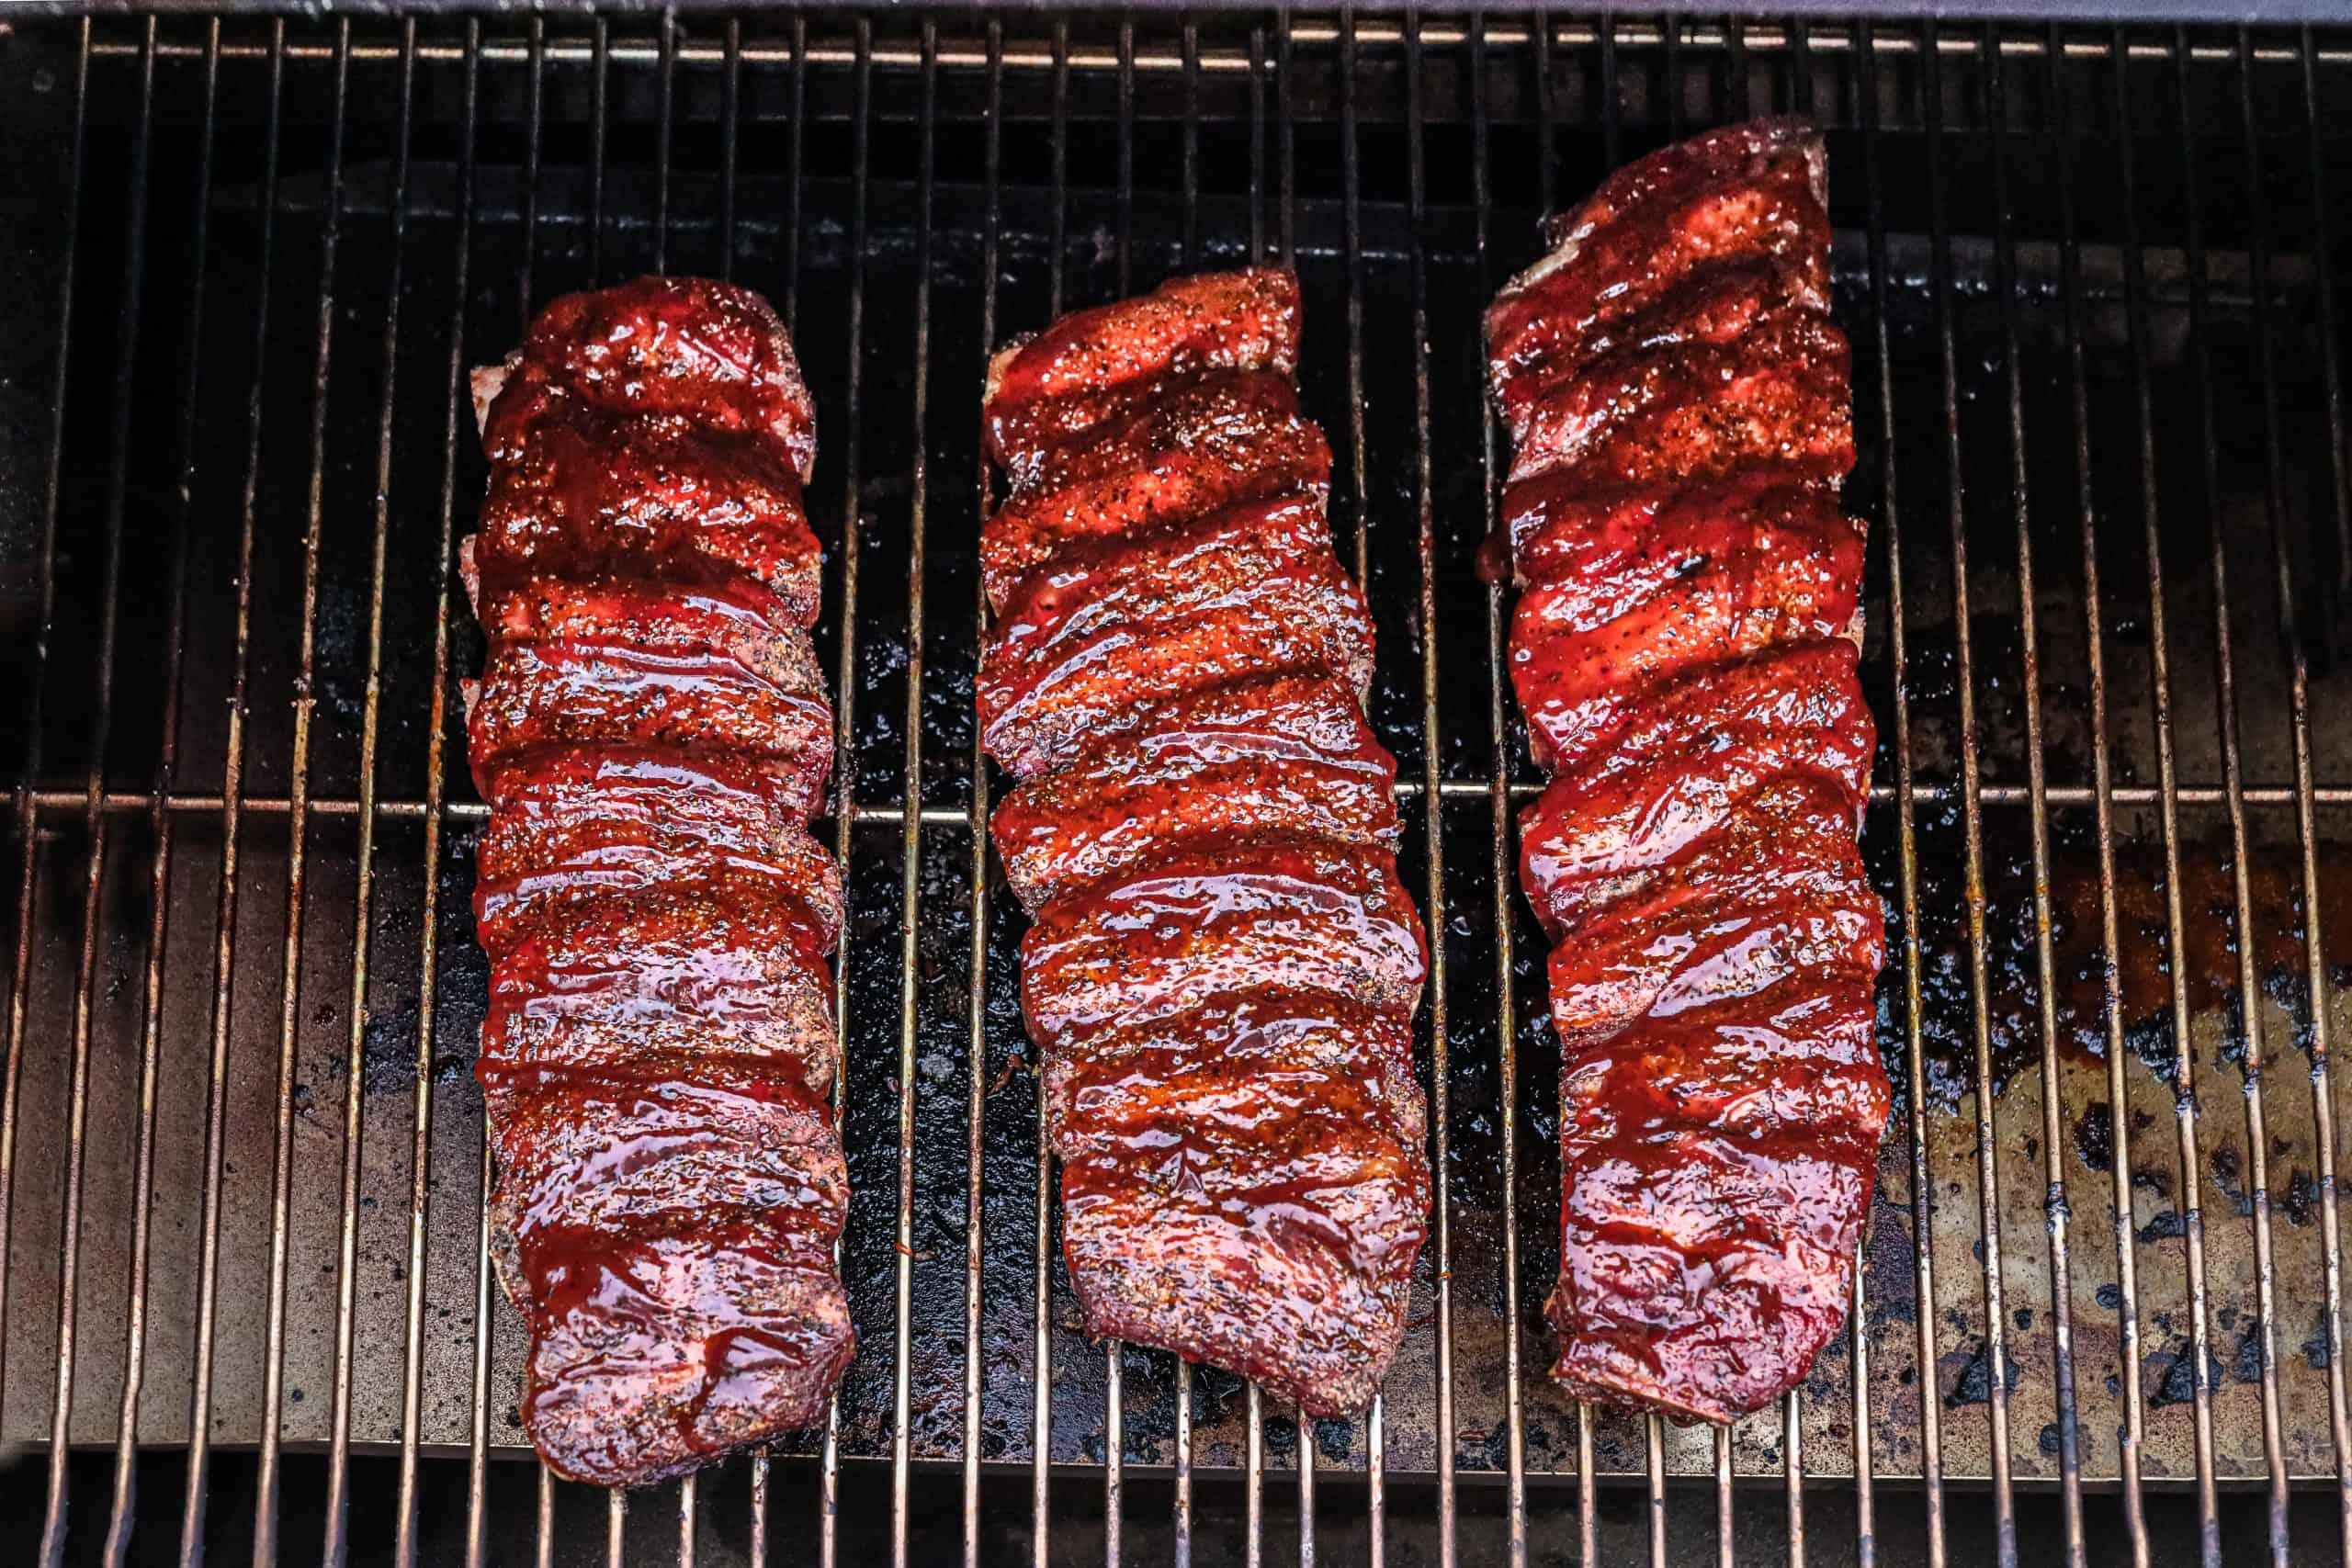 Finished ribs overhead photo on smoker.